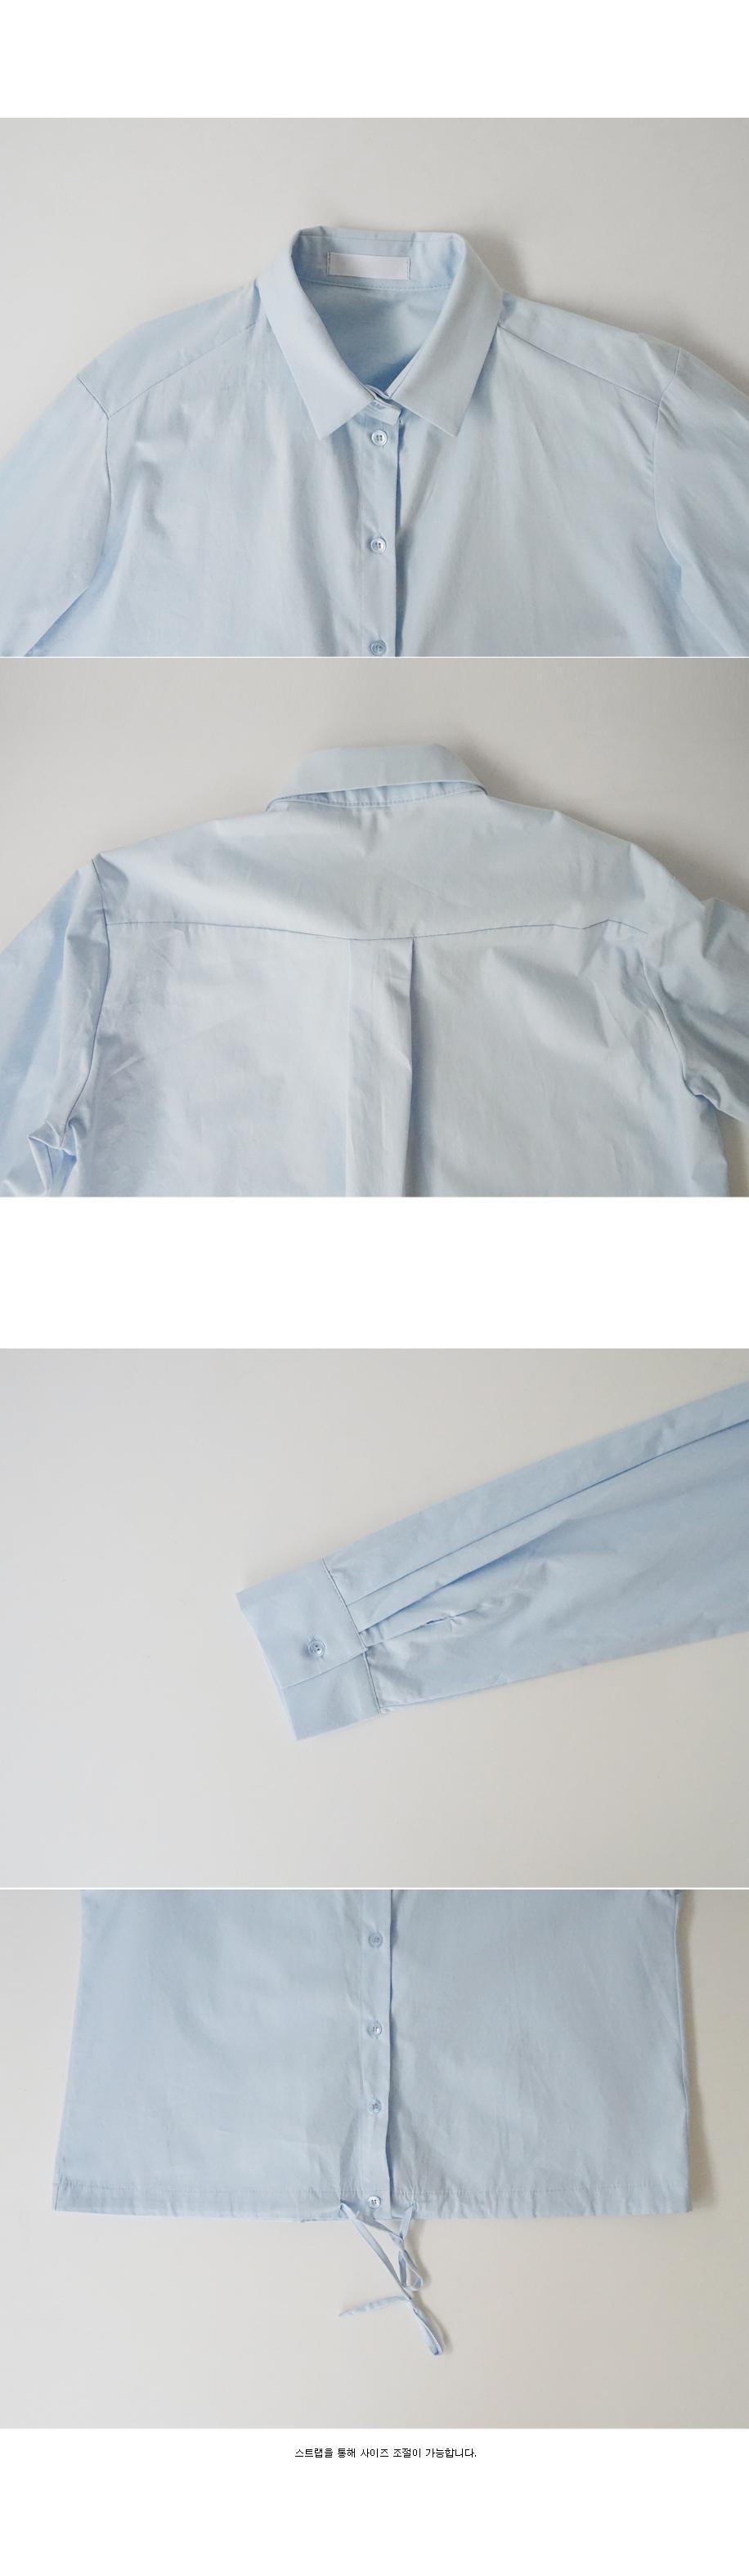 kitsch mood string shirt